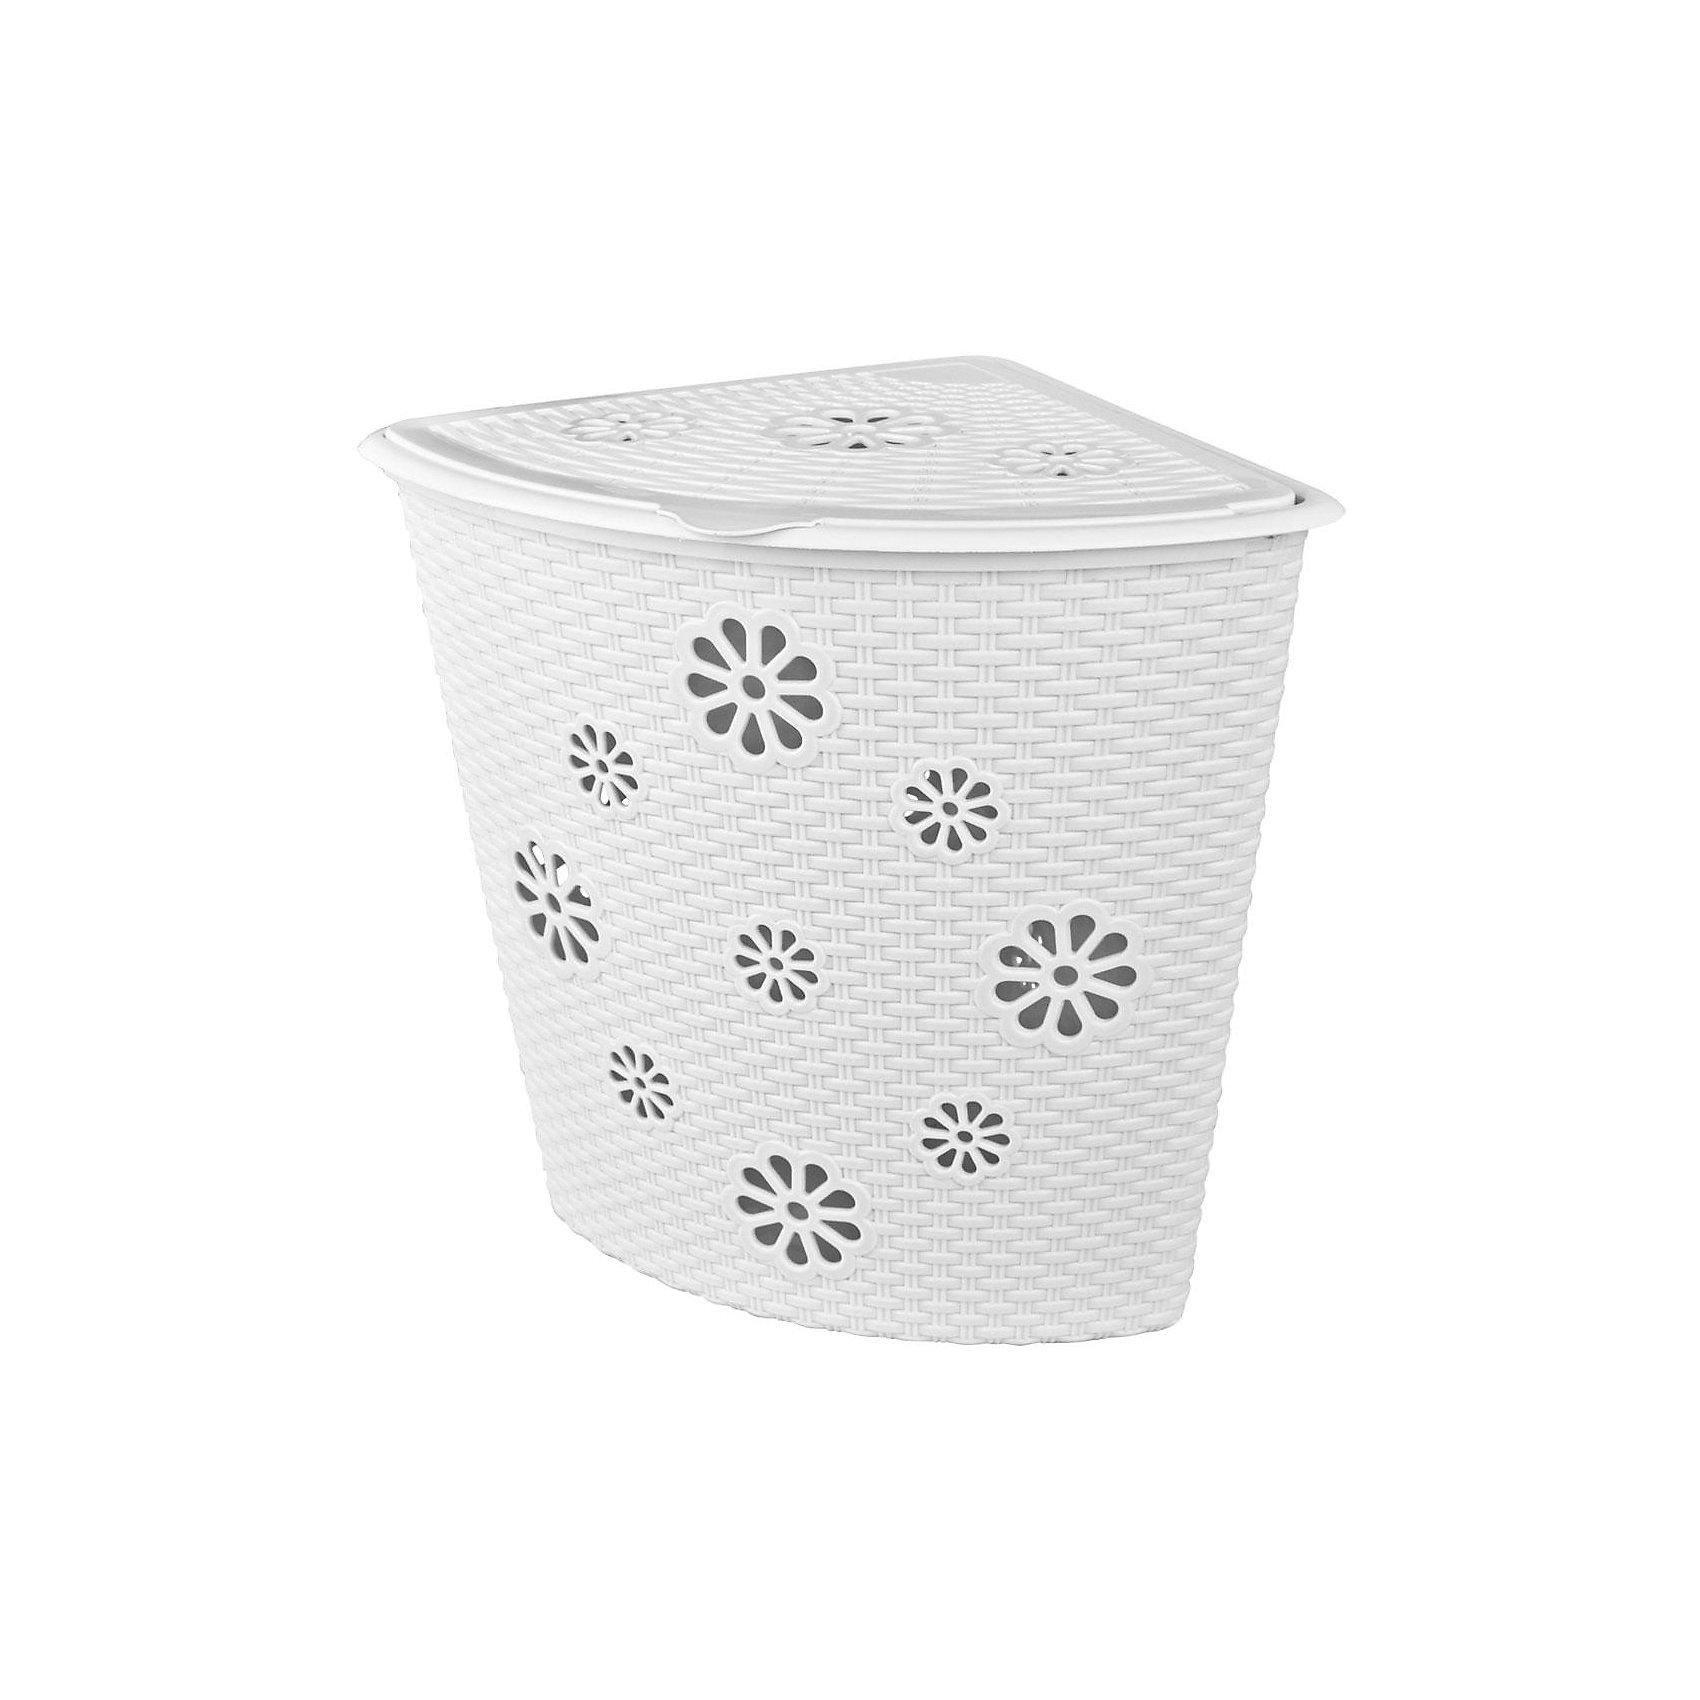 Alternativa Корзина для белья Плетёнка(500х385х460), Alternativa, белый корзина для белья сорренто 45л белый м1708